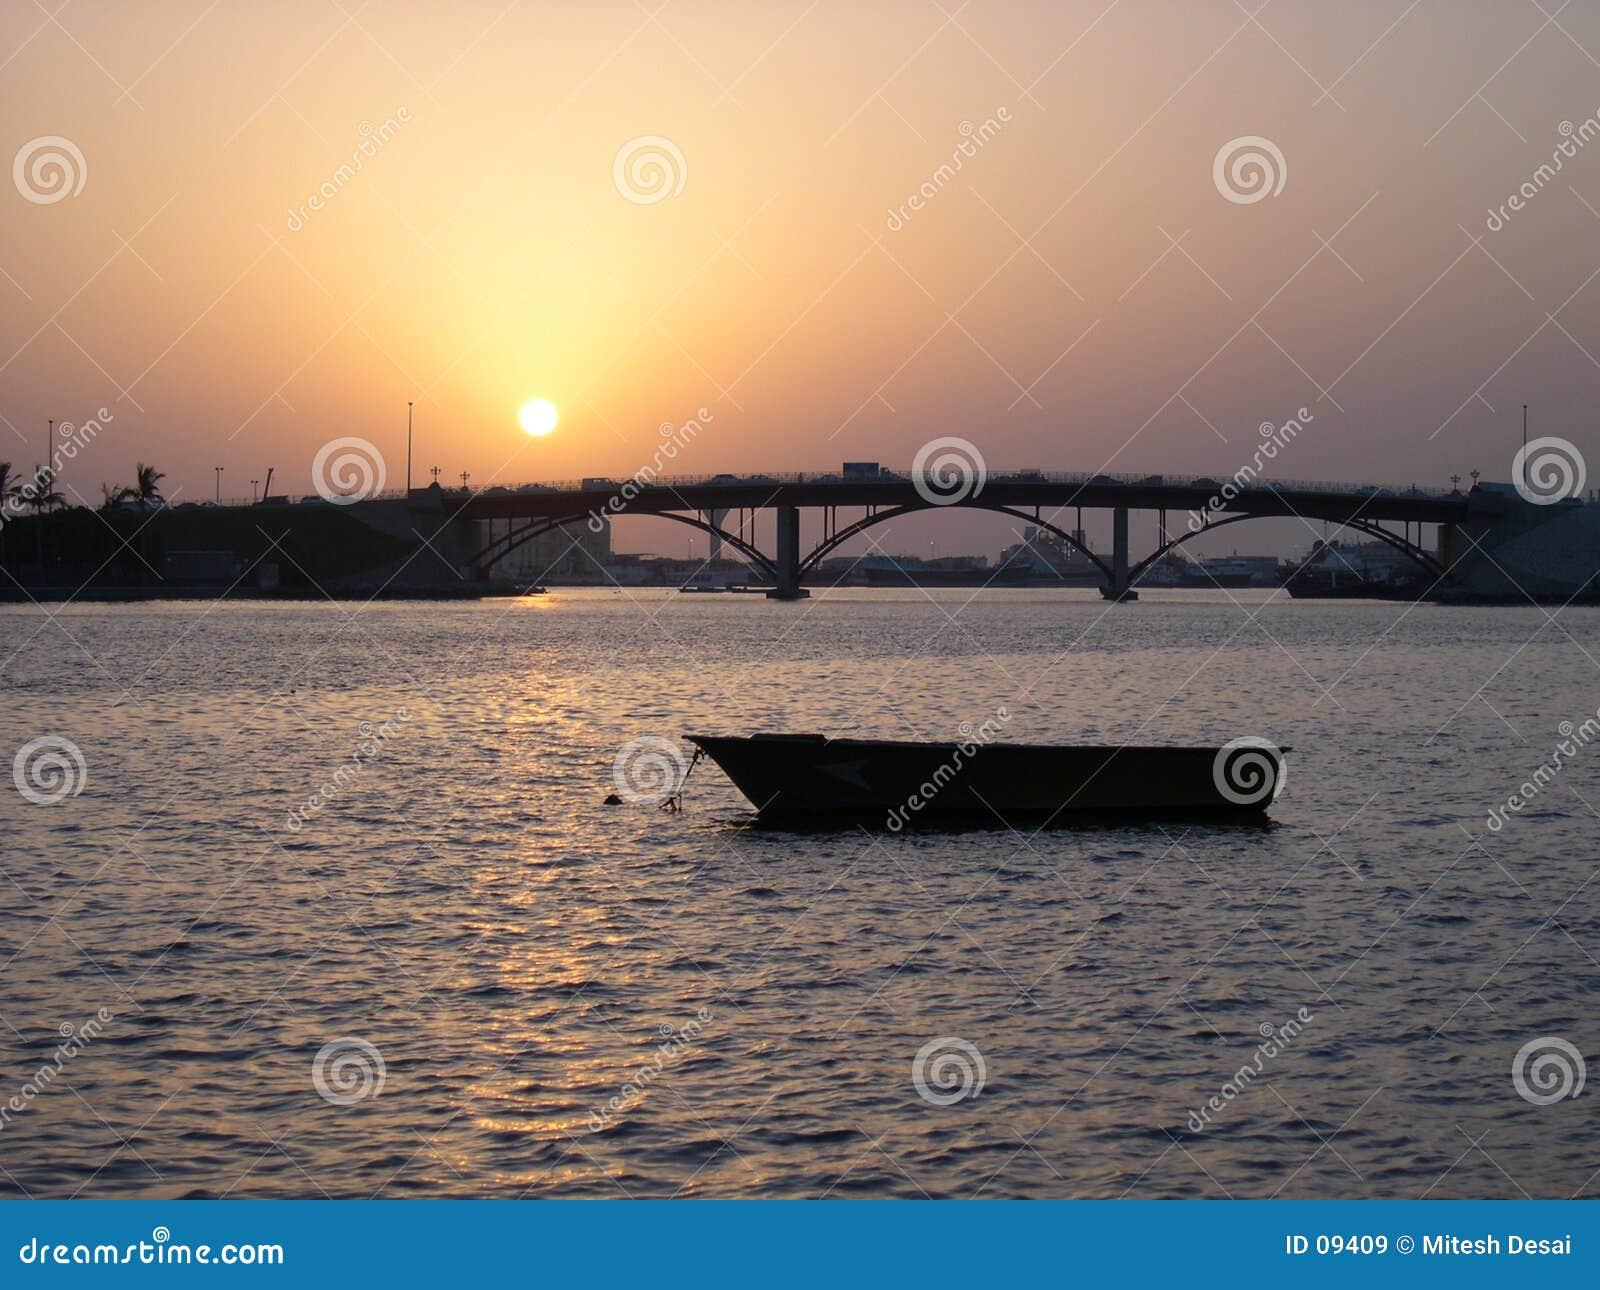 Sunset at Sharjah Corniche